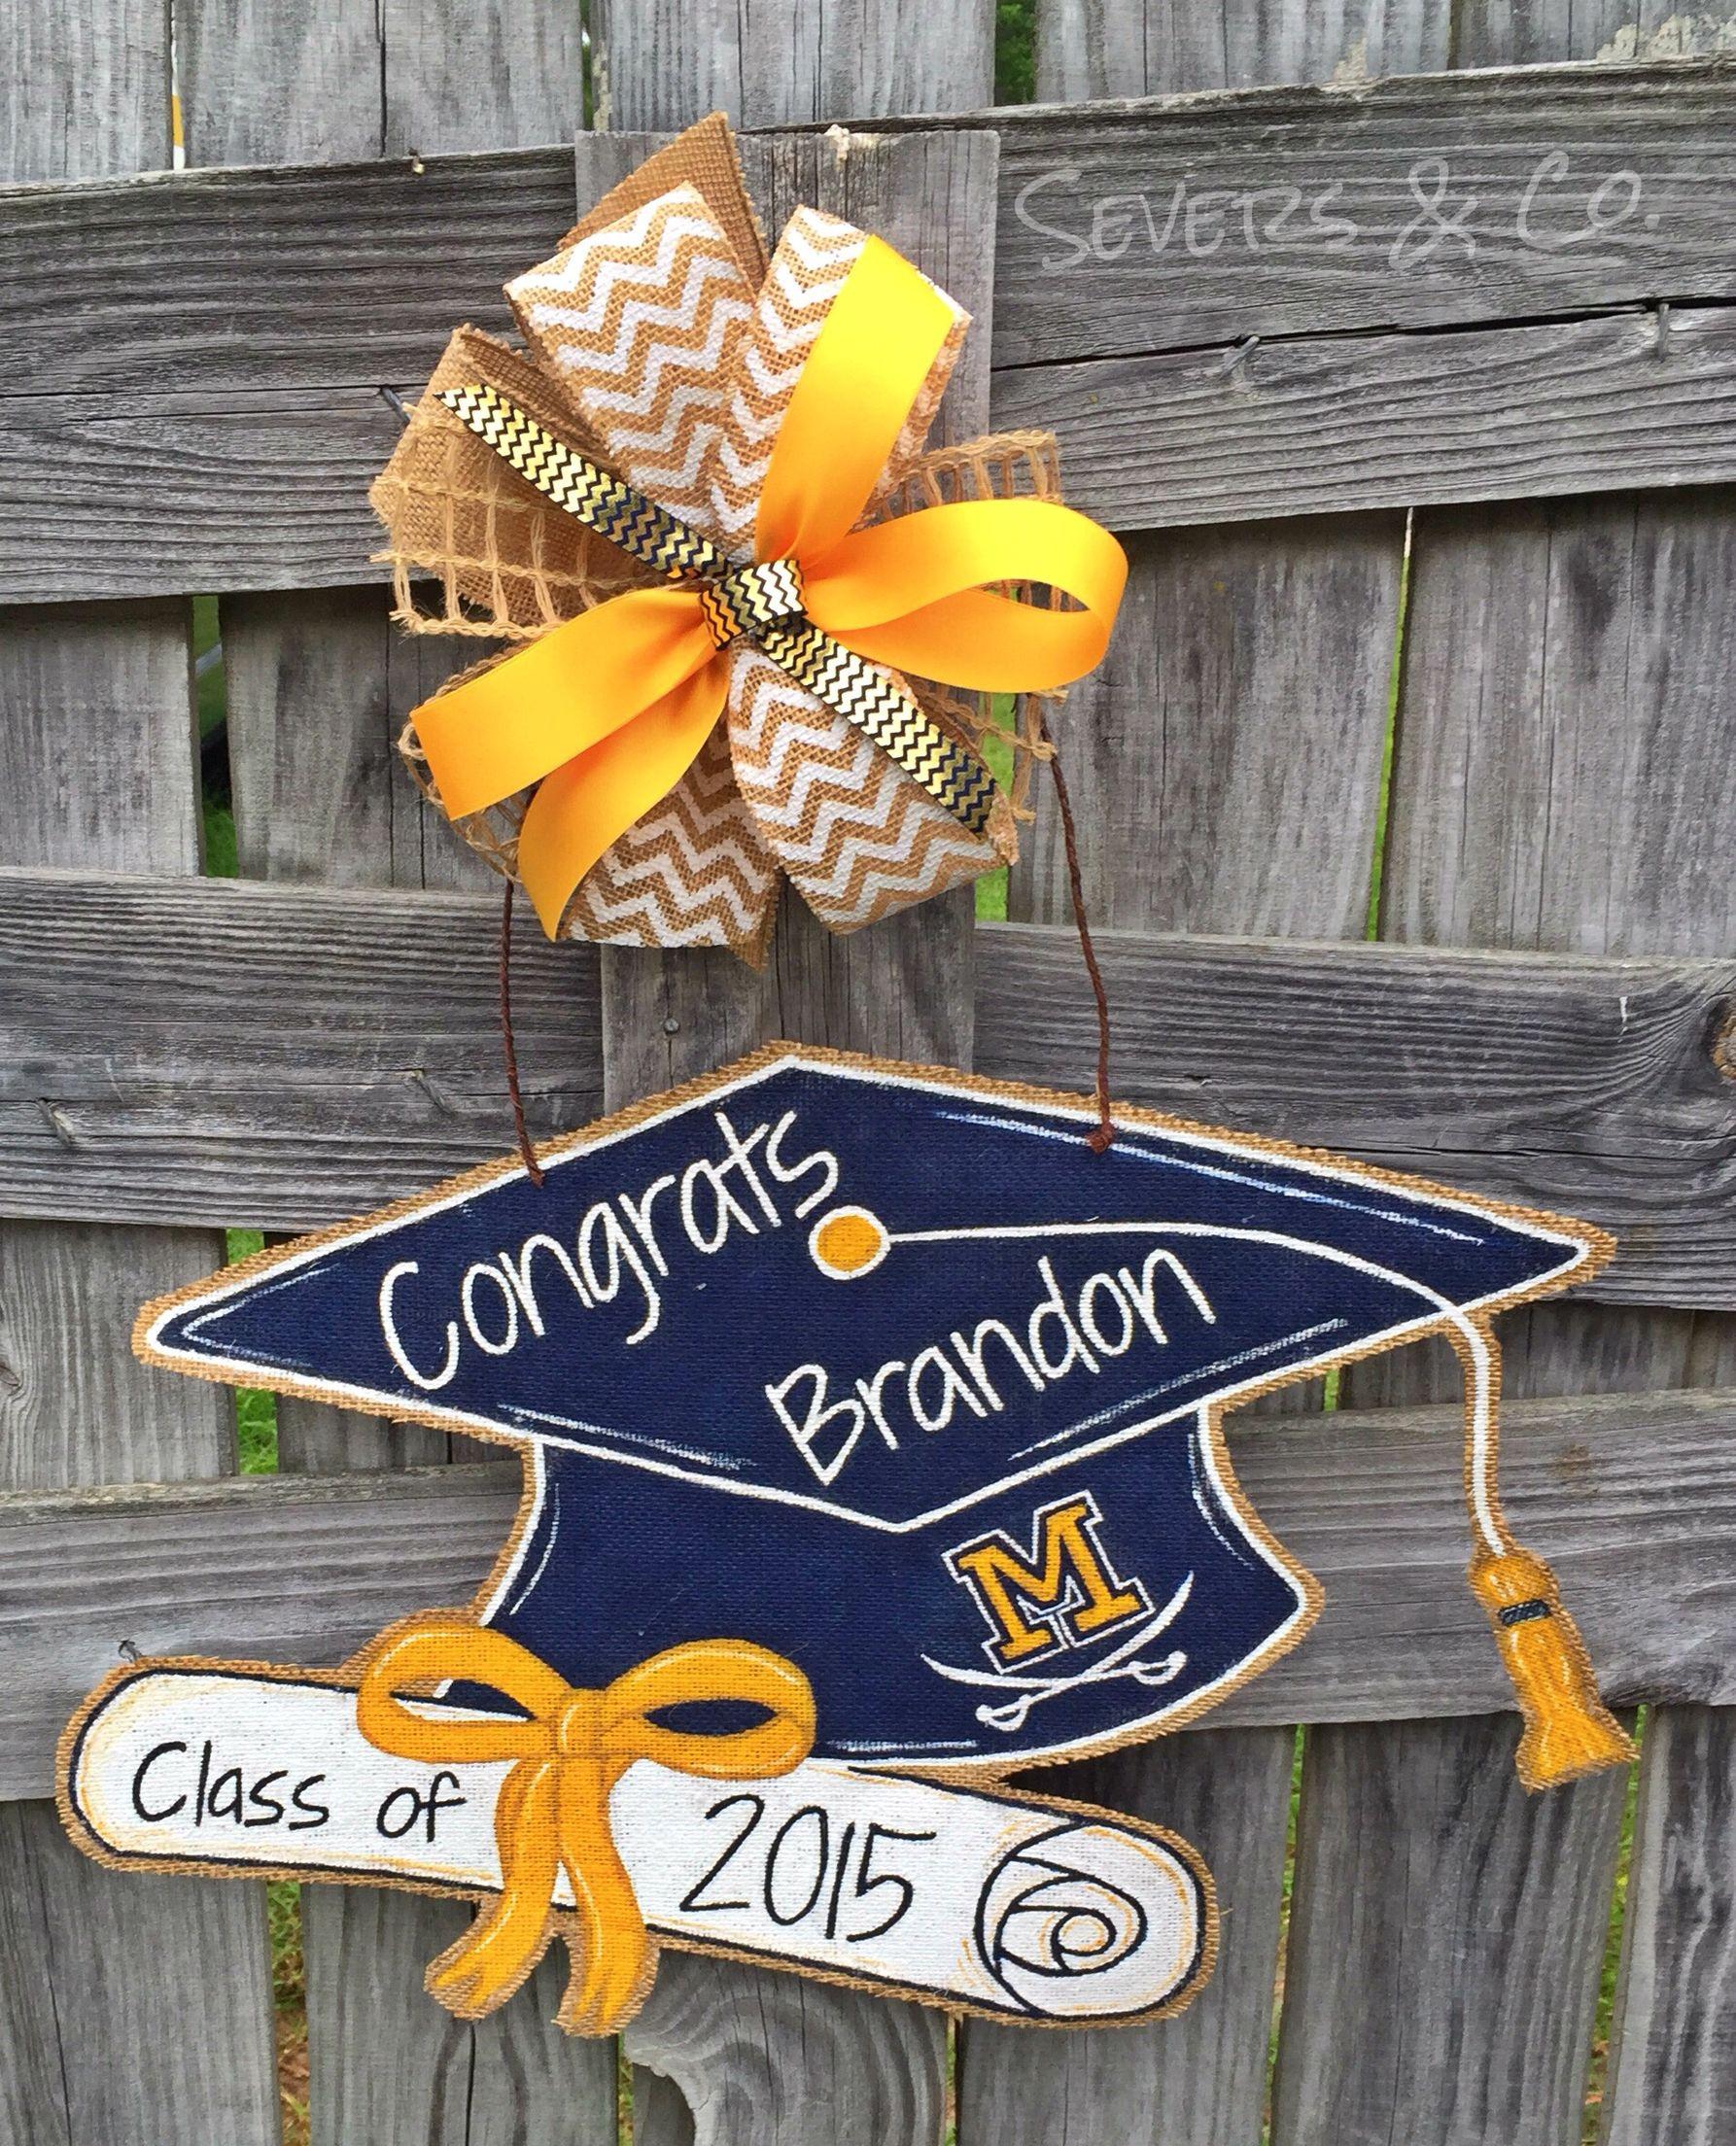 Graduation Cap Painted Wood Door Hanger With Custom Colors Etsy In 2021 Graduation Party Decor Personalized Graduation Gifts Wood Door Hangers